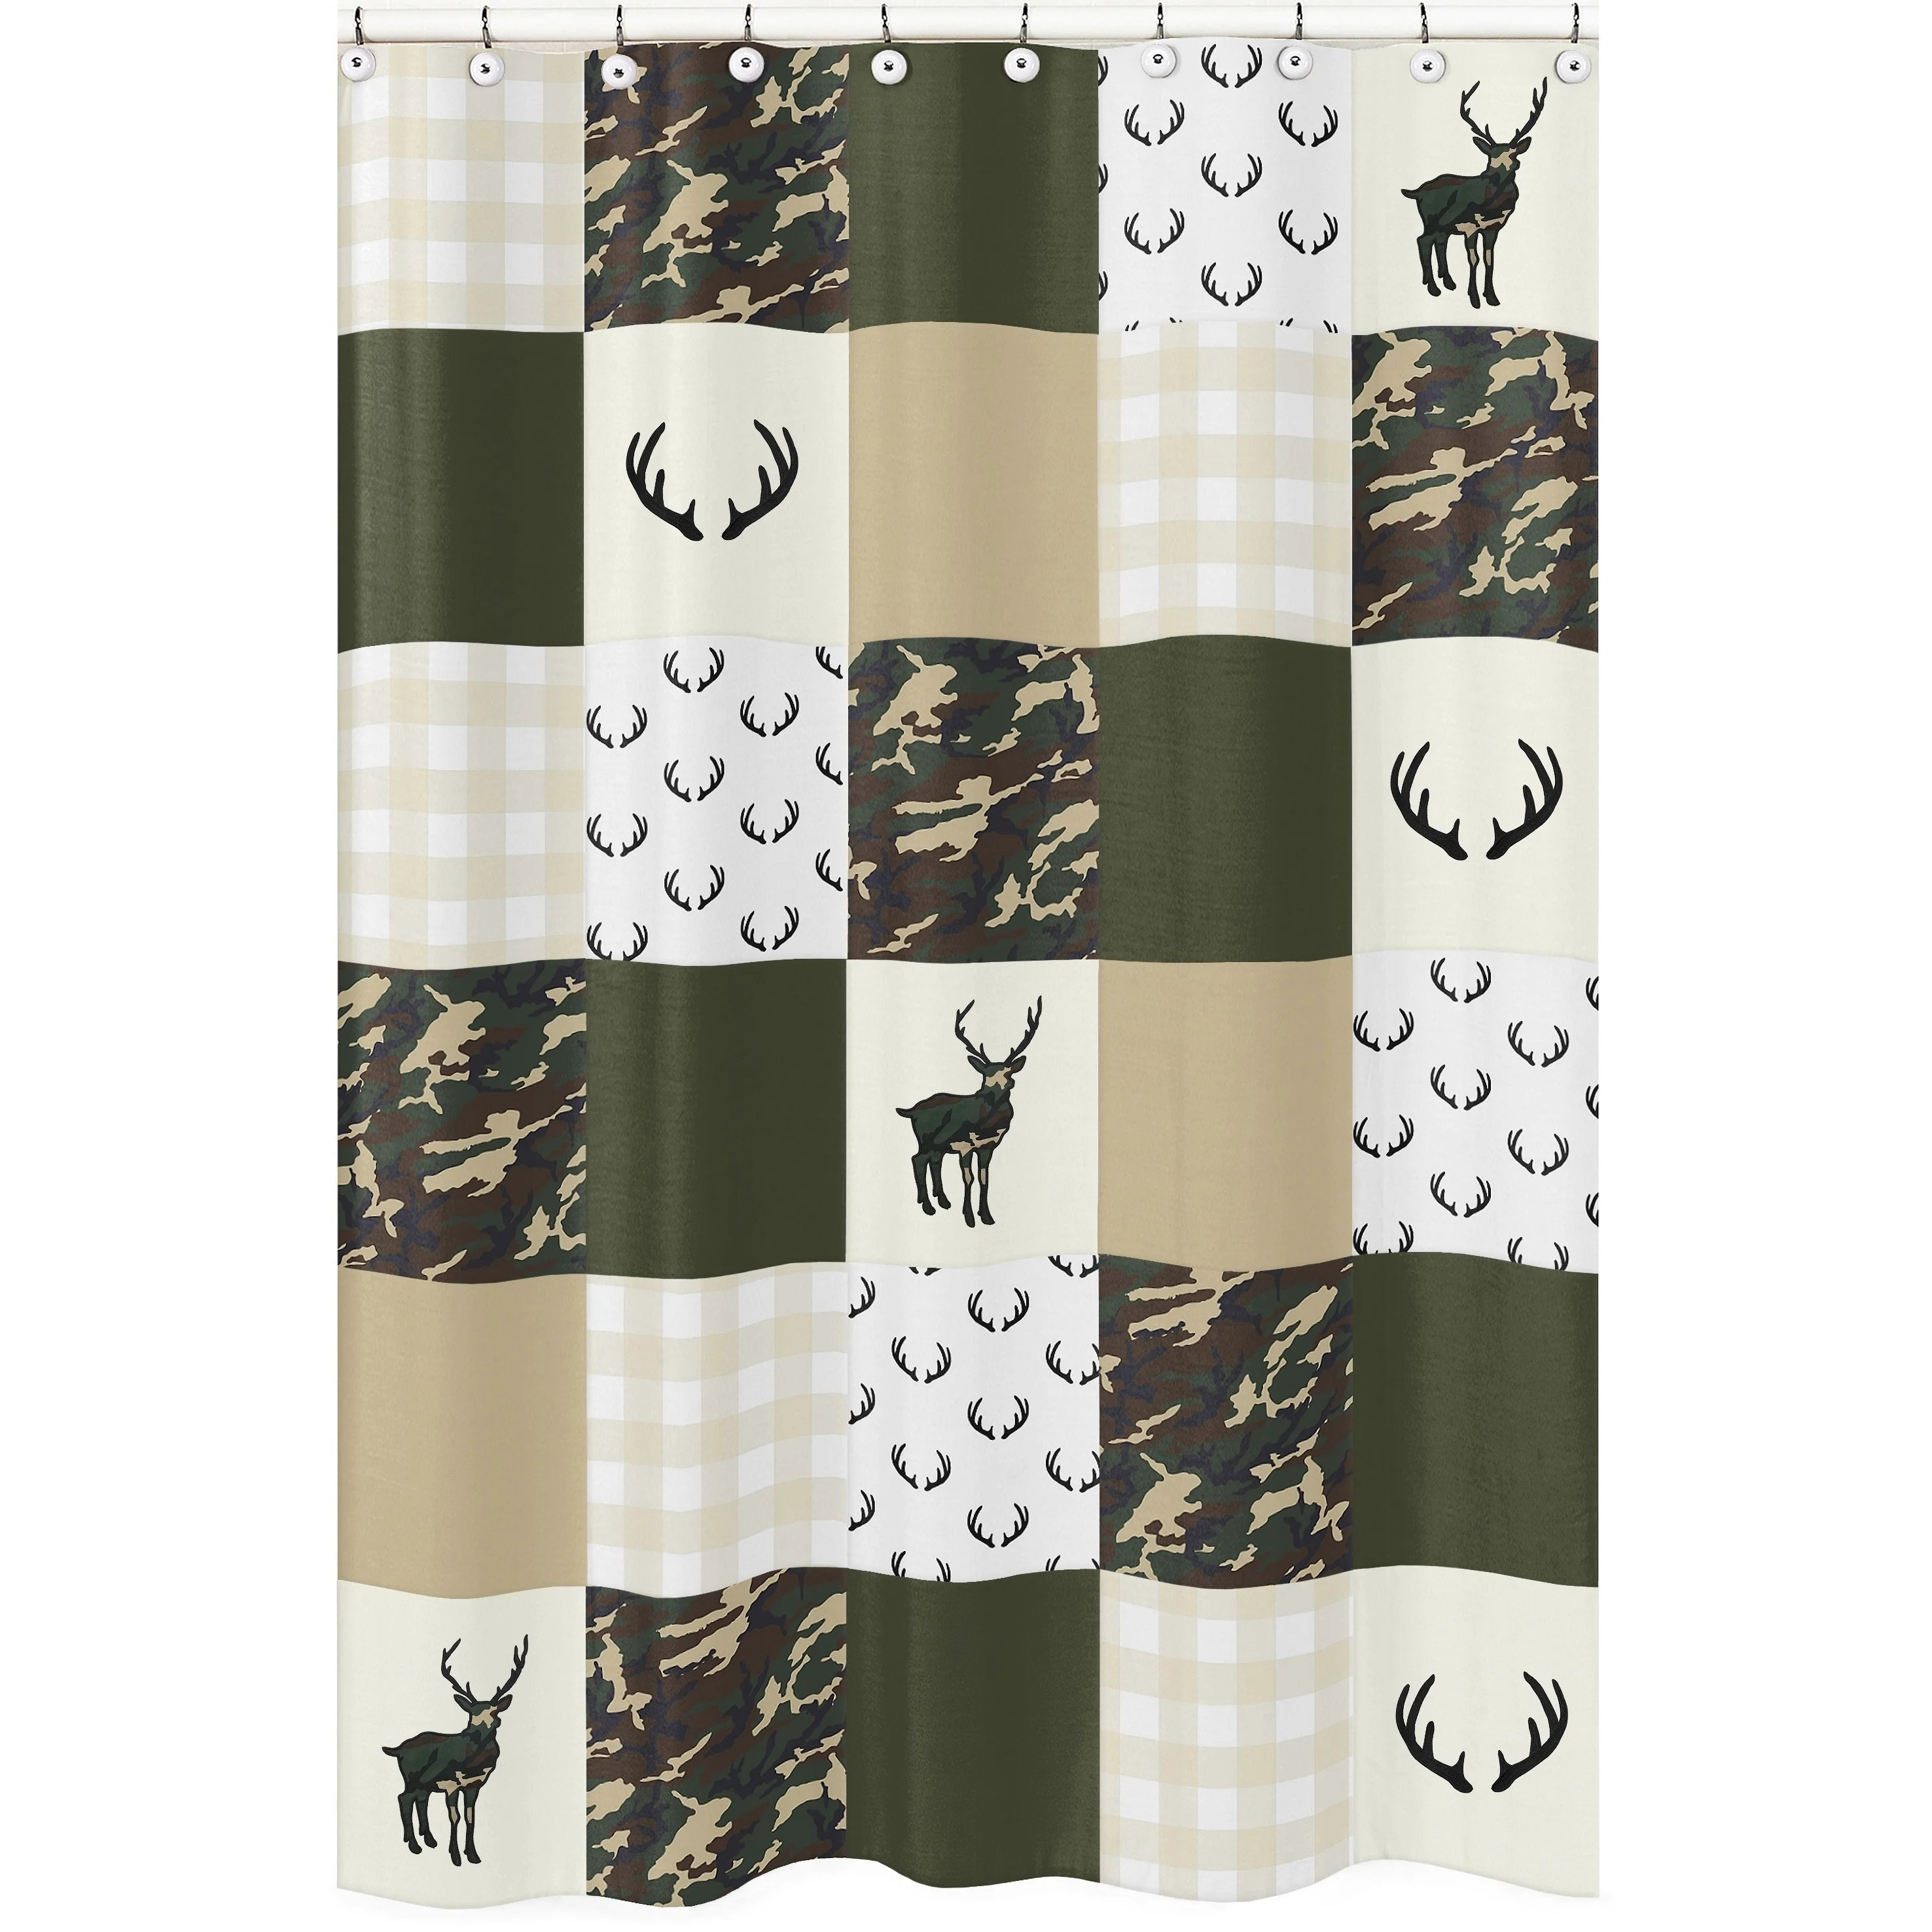 Sweet Jojo Designs Green And Beige Deer Buffalo Plaid Check Woodland Camo Collection Bathroom Fabric Bath Shower Curtain